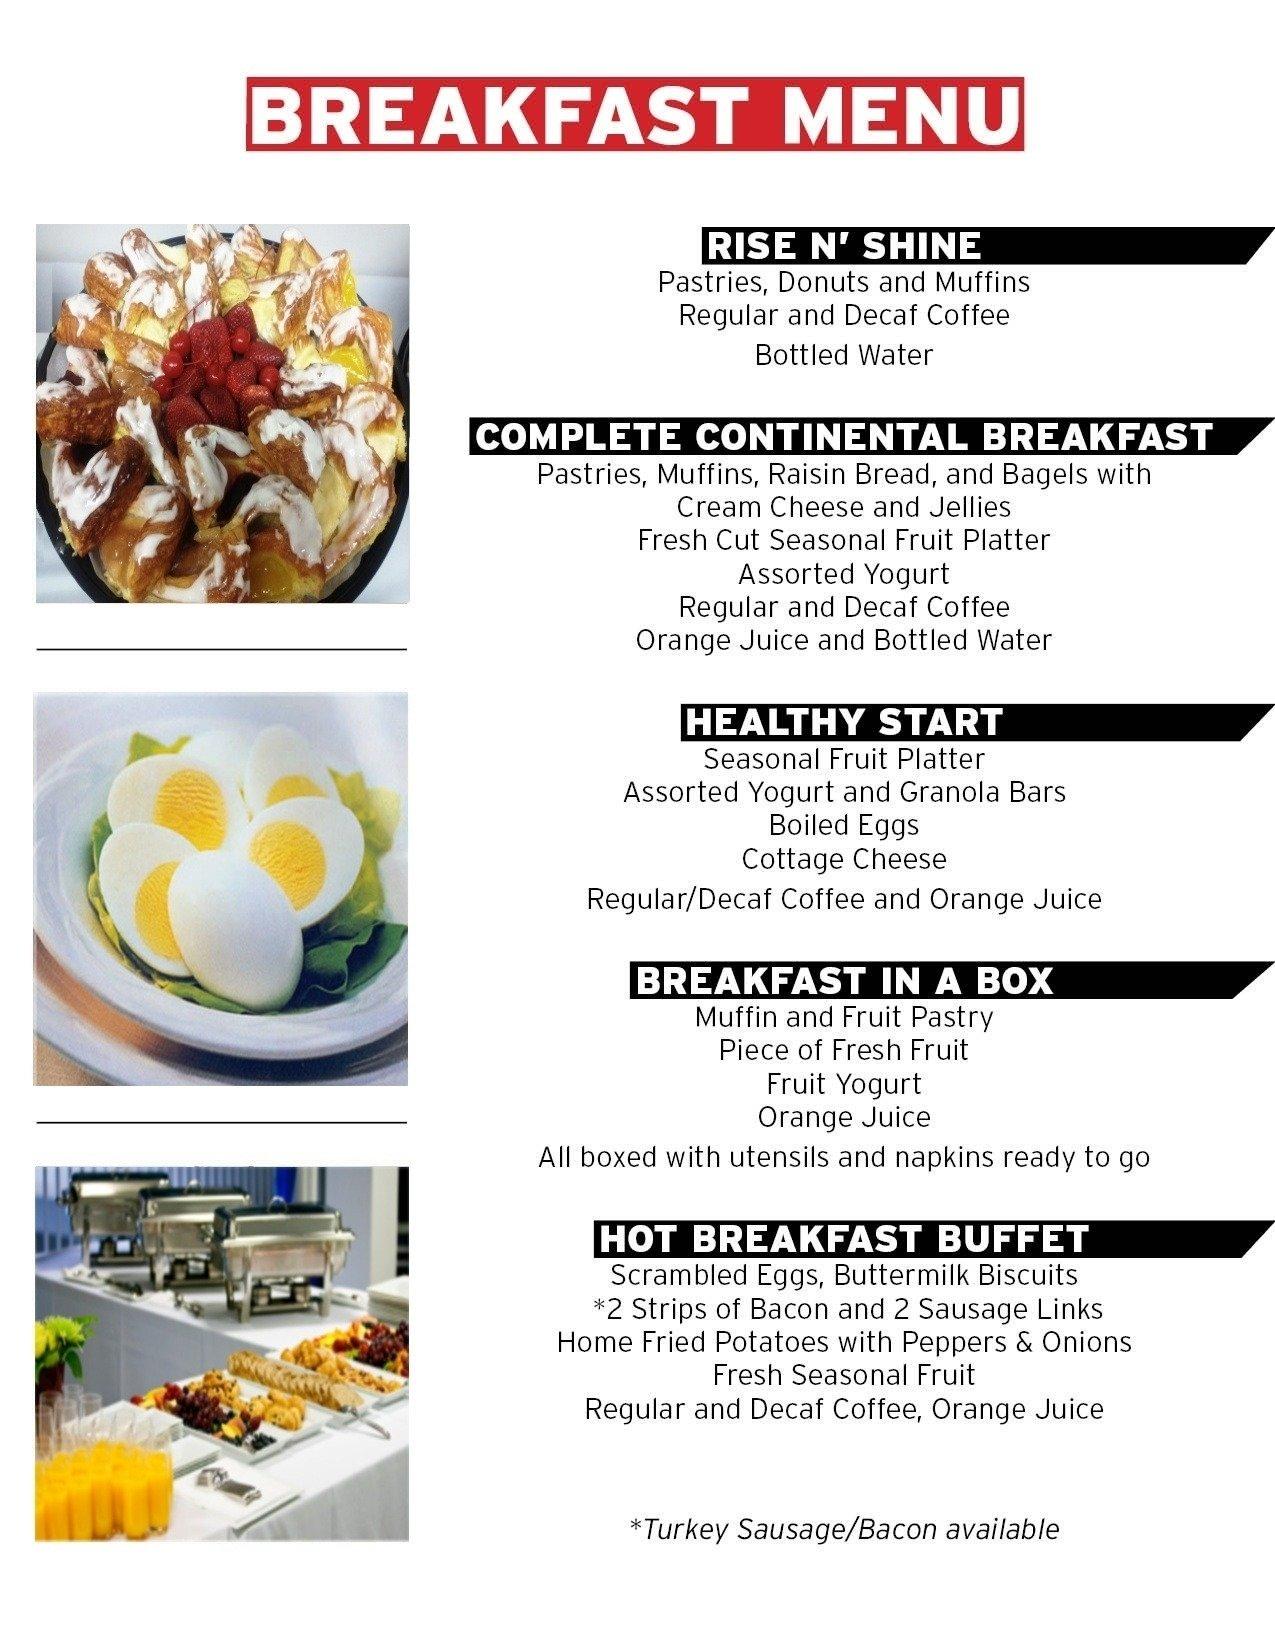 10 Fantastic Healthy Menu Ideas For The Week simple breakfast menu ideas world of printable and chart 2020